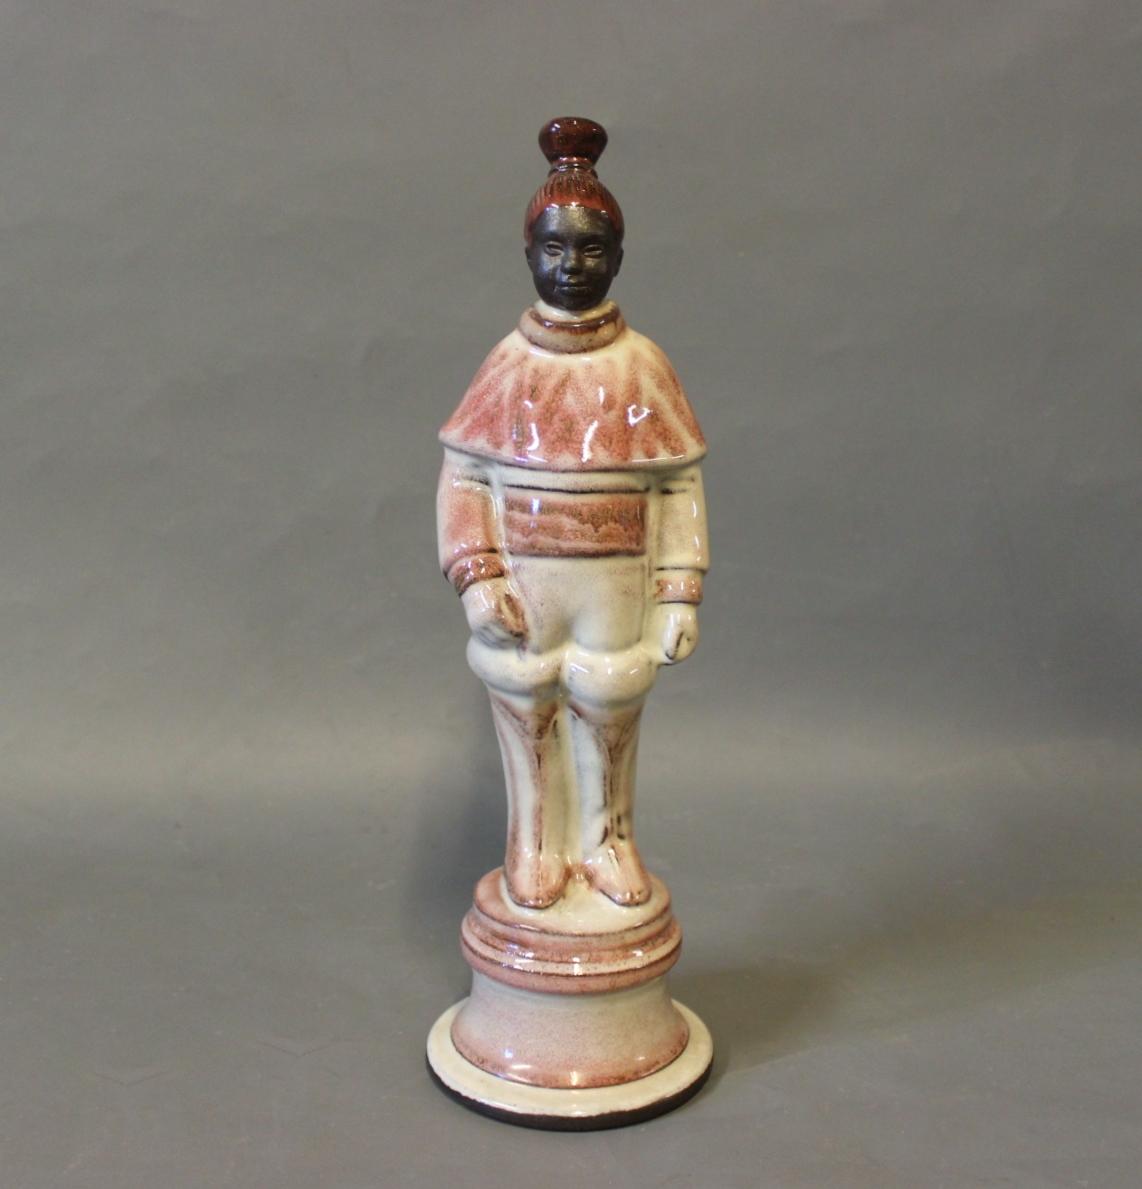 hyllested keramik .Antikvitet.  Keramisk figur af Herman A. Kähler for  hyllested keramik